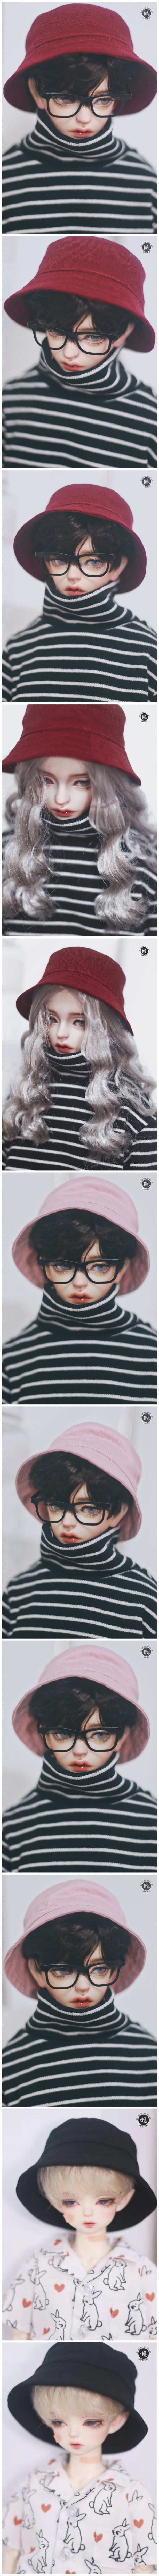 BJD Pink/Red/Black Bucket Hat for MSD/SD